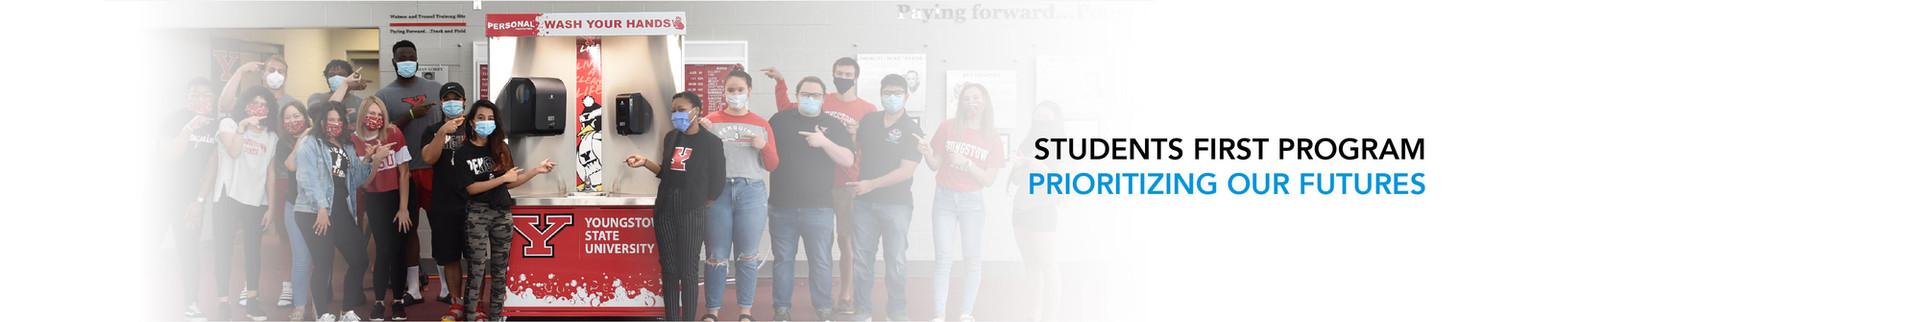 Students First Program